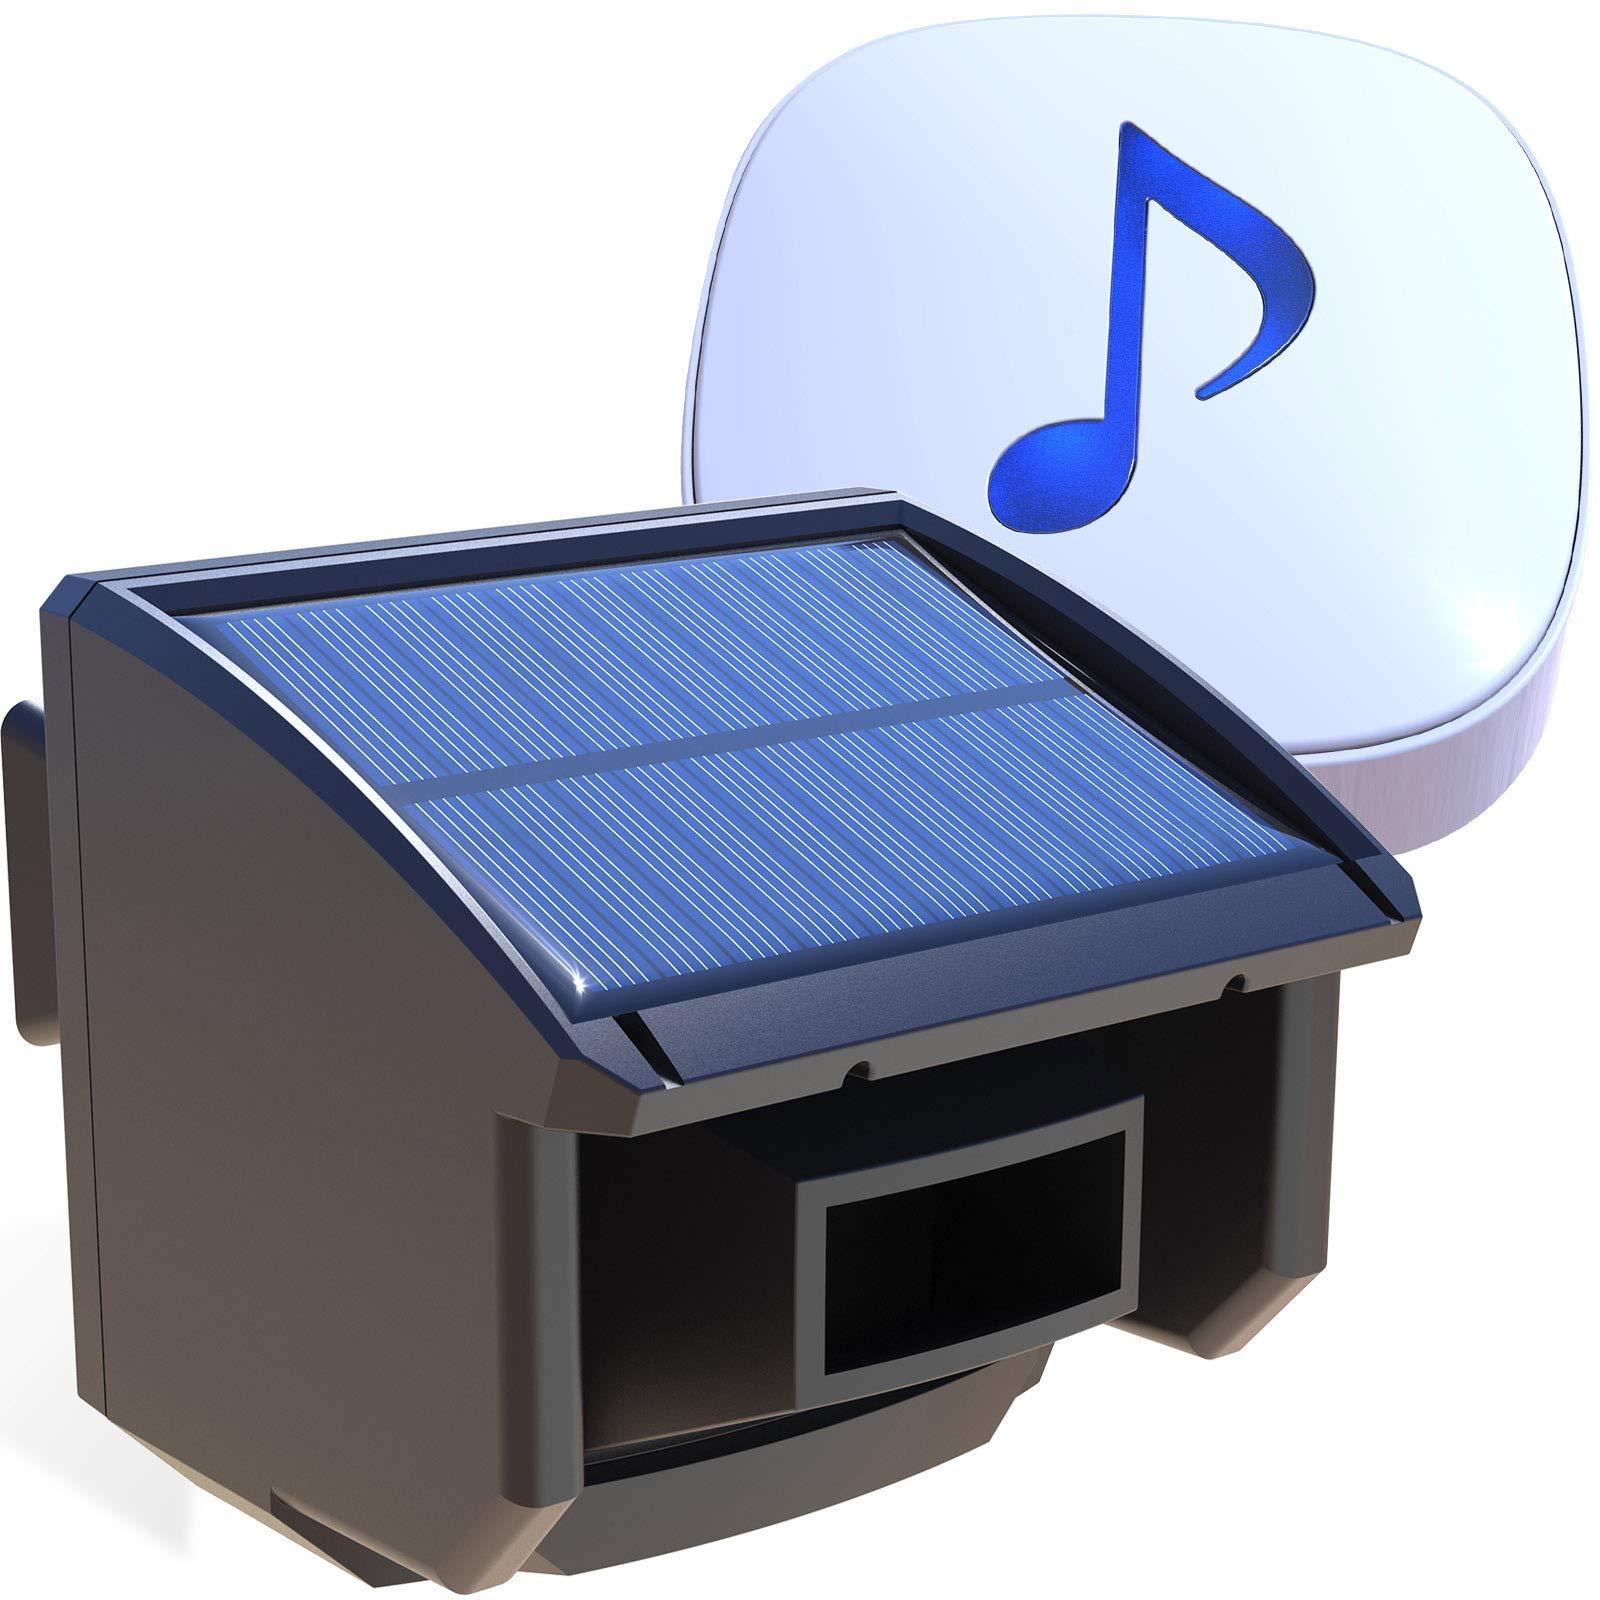 Htzsafe Solar Driveway Alarm System-1/4 Mile Long Transmission Range-Solar Powered No Need Replace Batteries-Outdoor Weatherproof Motion Sensor&Detector DIY Security Alert System by HTZSAFE